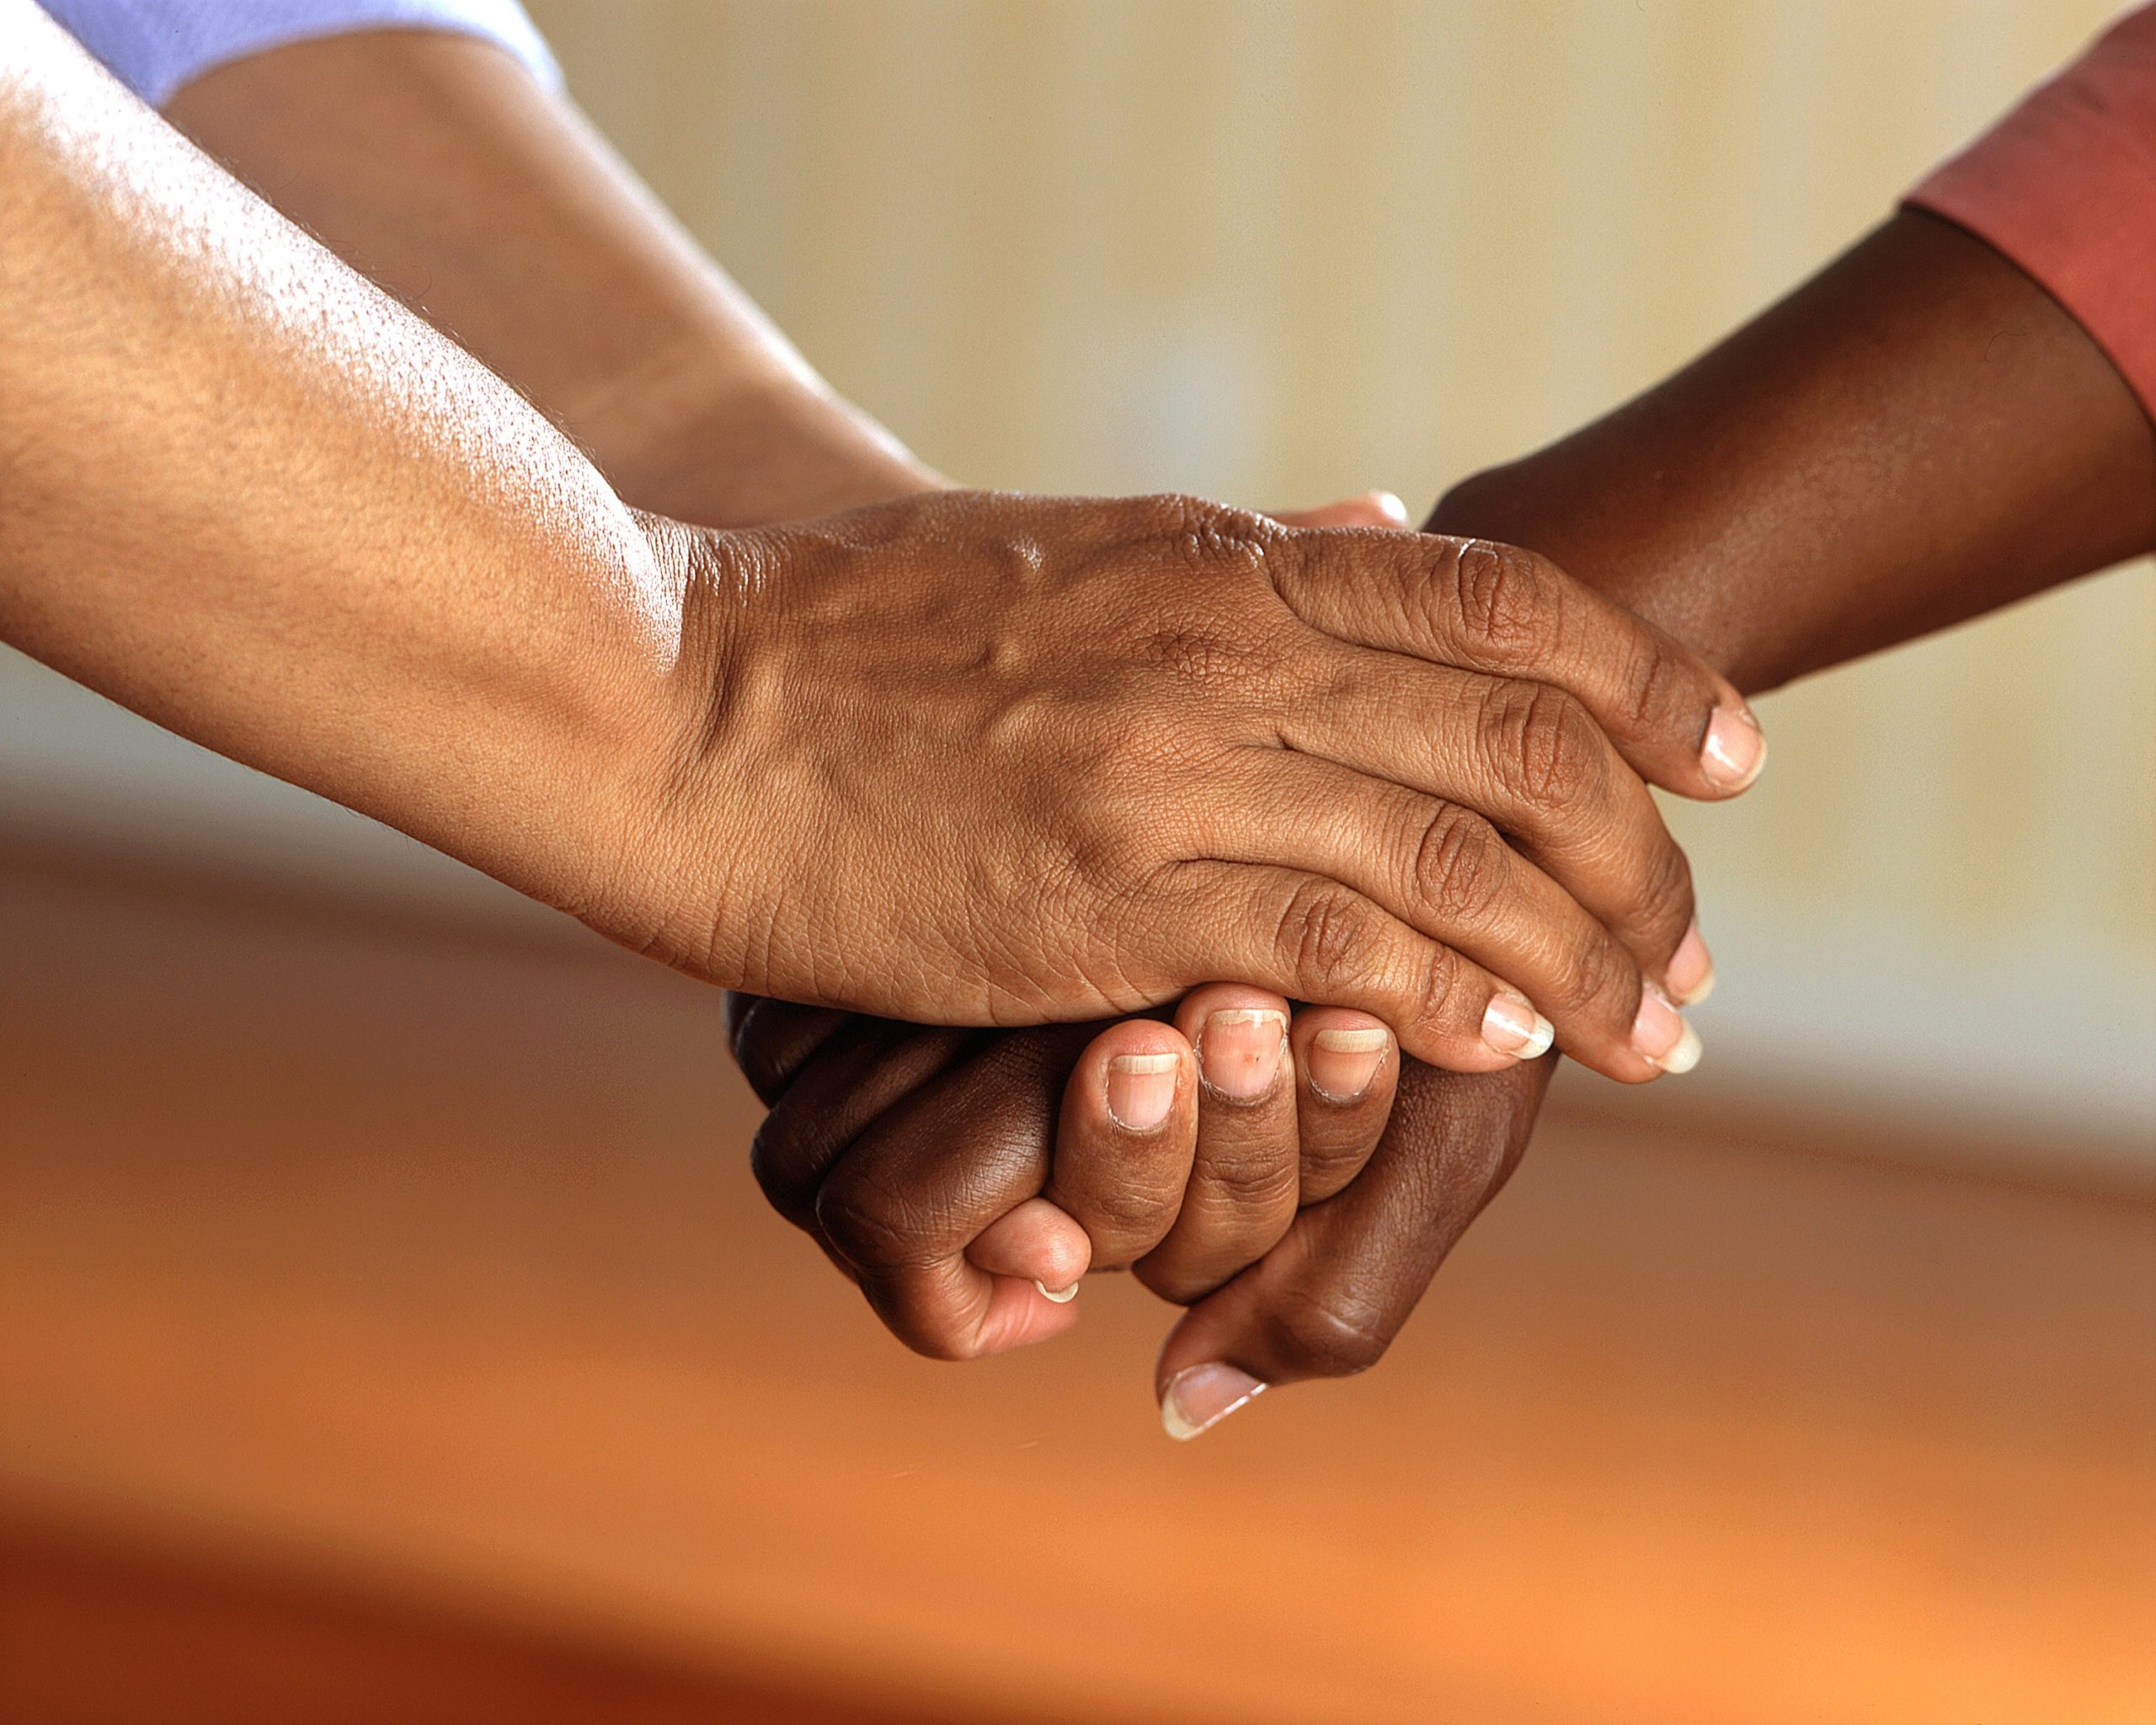 Hospice vs Comfort Care